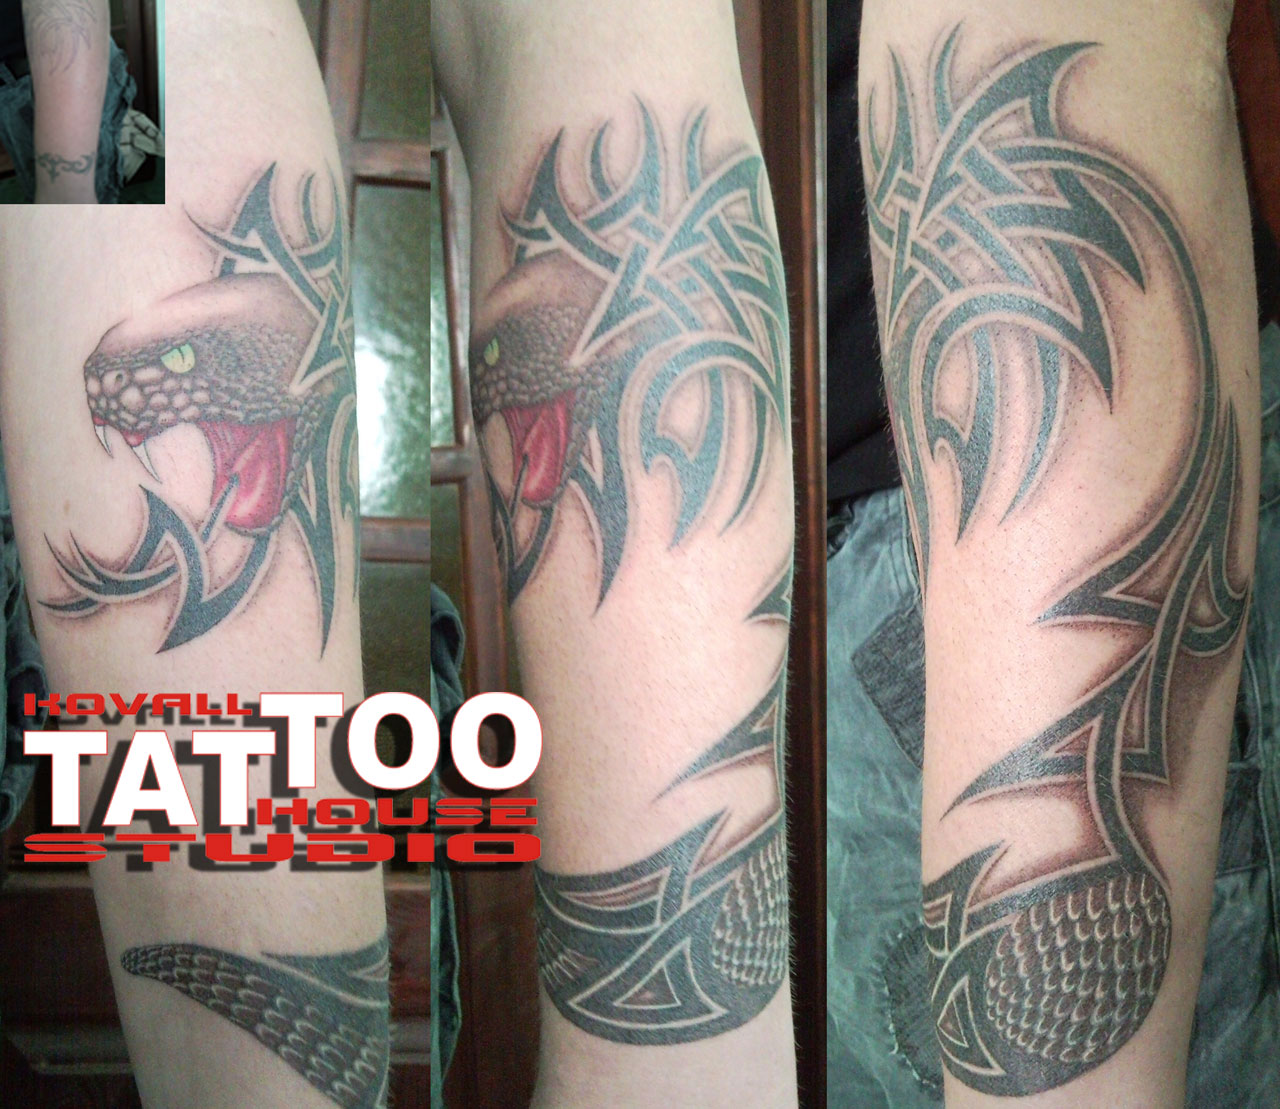 tattoo and work